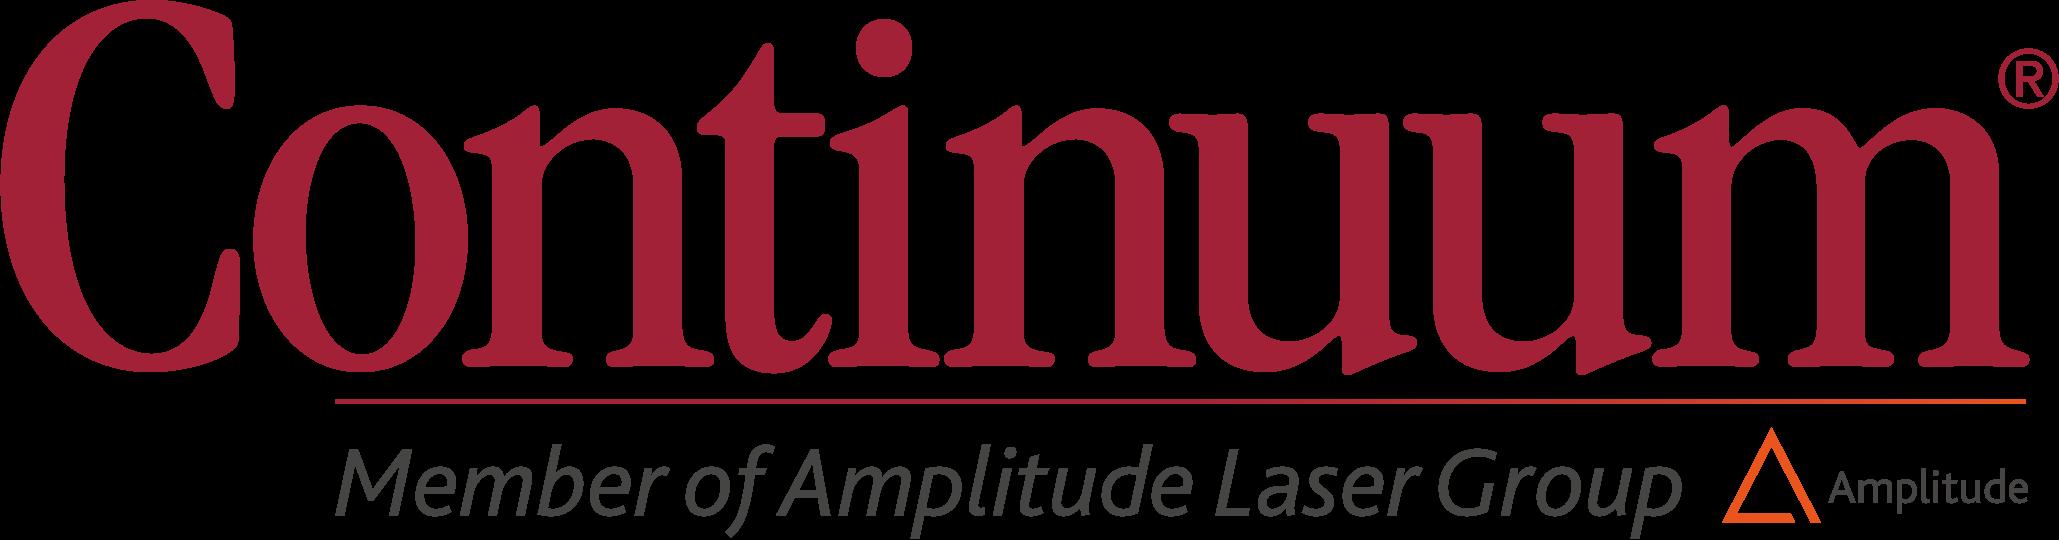 Continuum - Member of Amplitude Laser Group